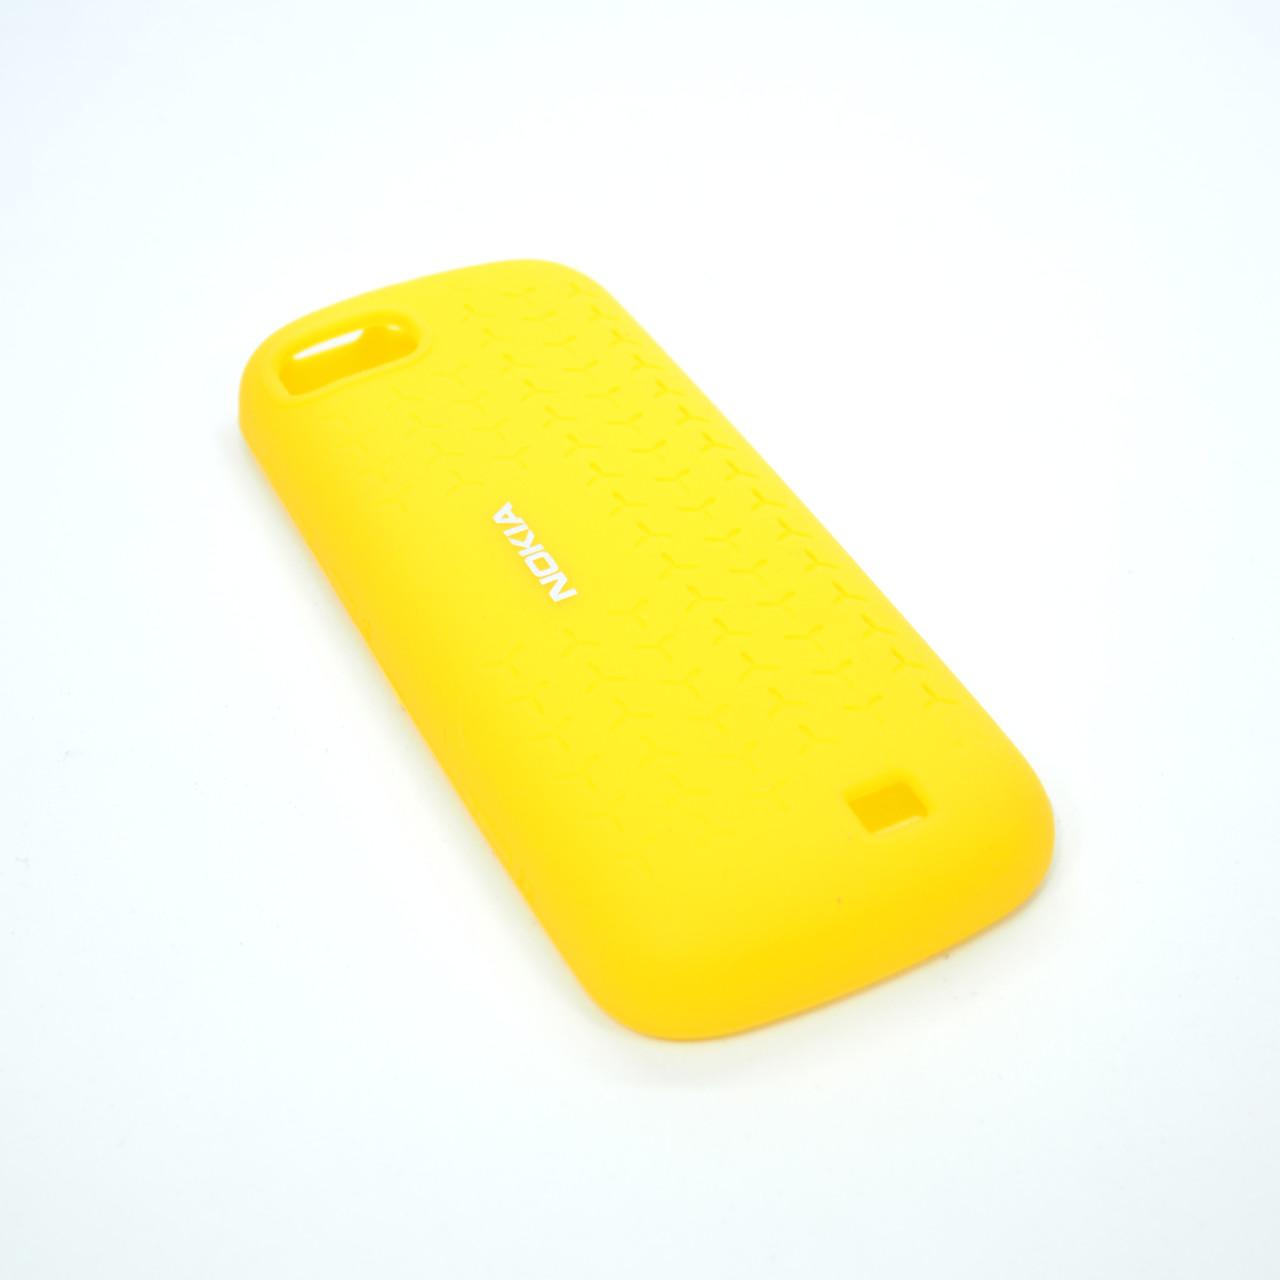 Чехлы для Nokia CC-1014 C3-01 Silicone Cover yellow Для телефона